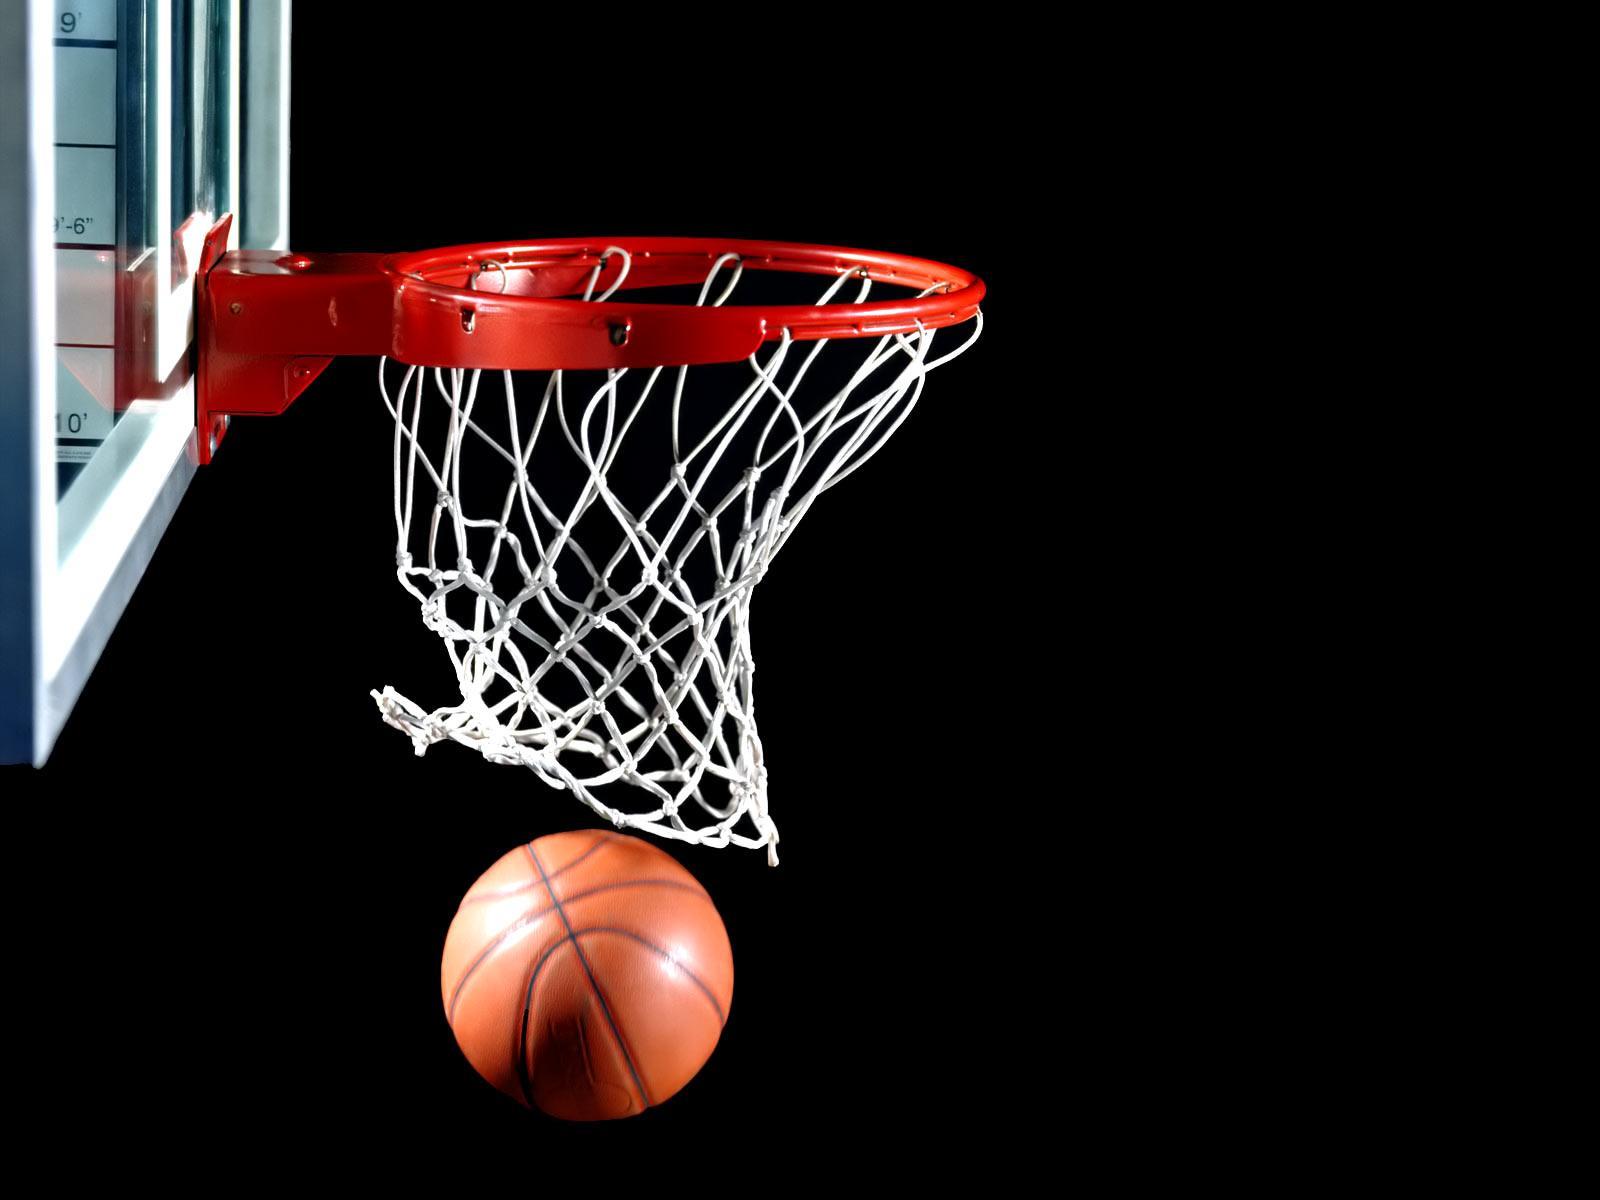 Basketball Sports Hd Photo PPT Backgrounds